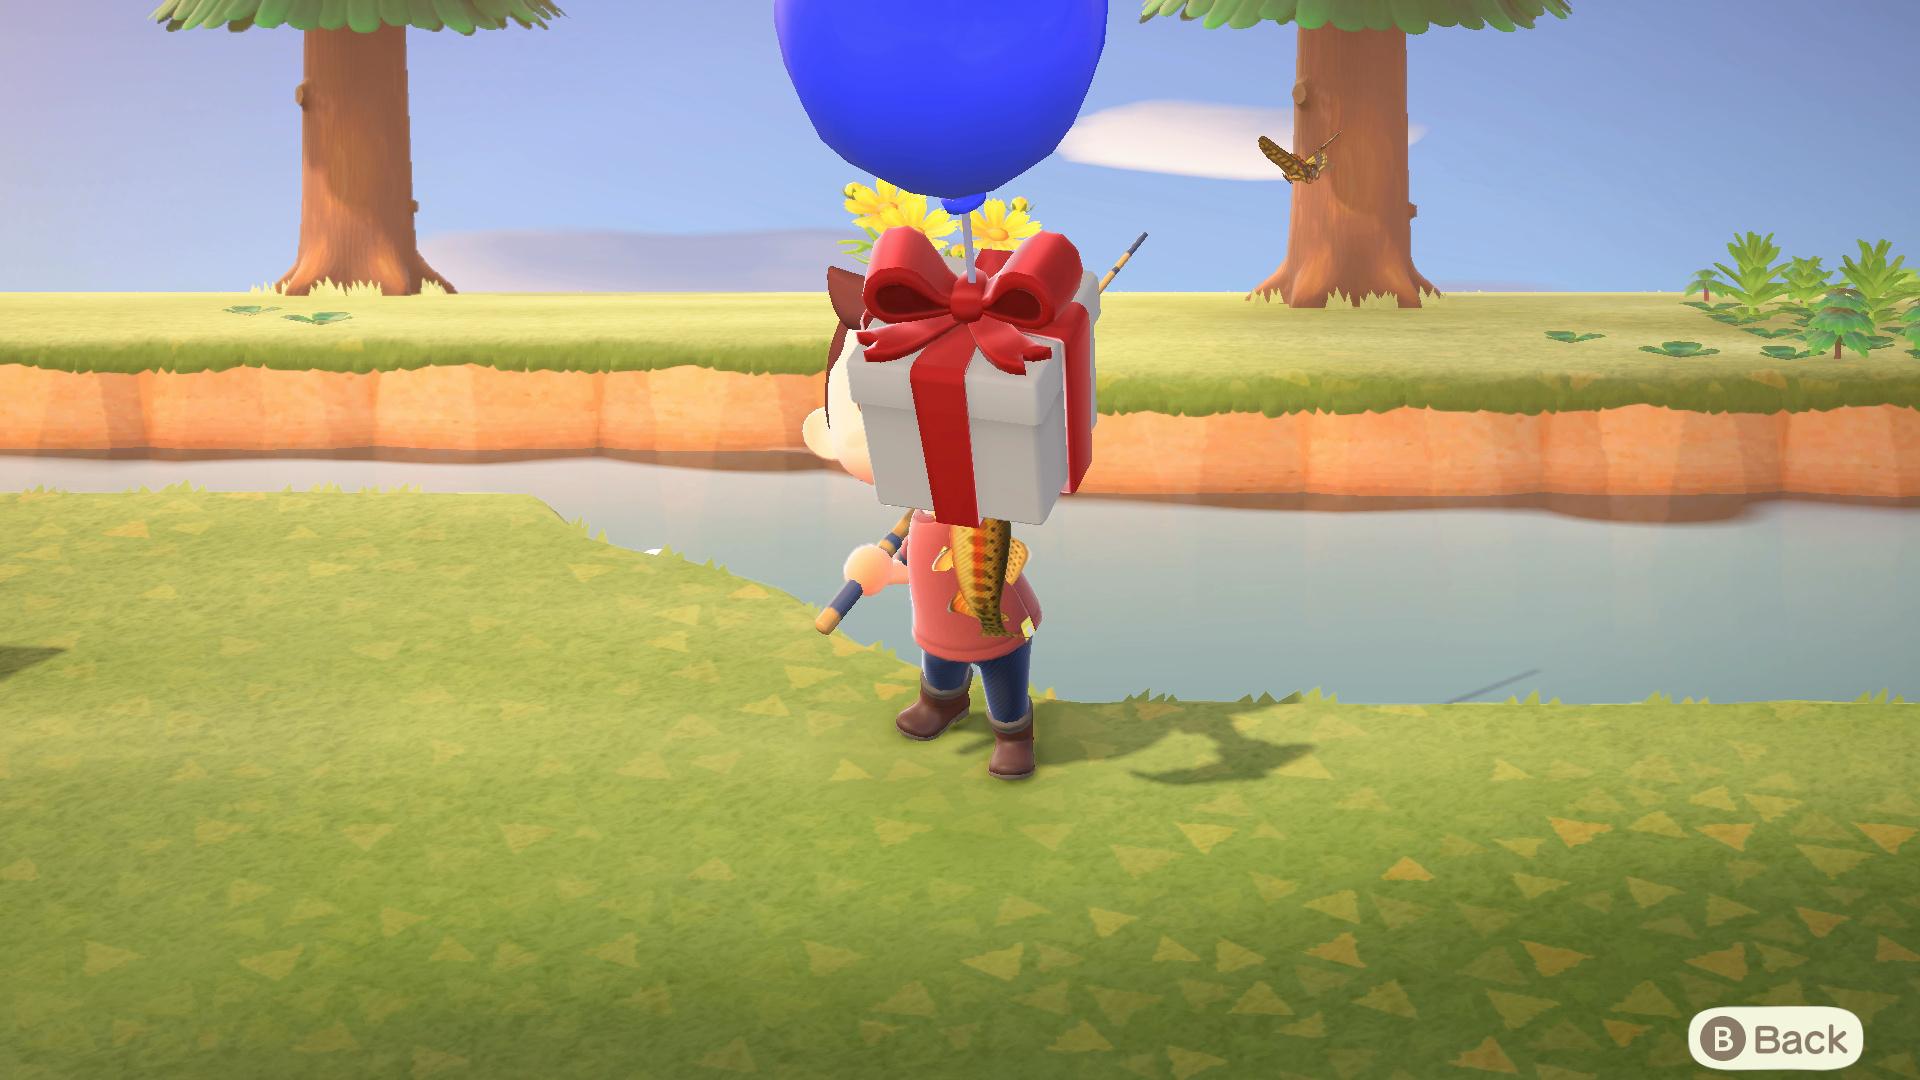 blue balloon animal crossing new horizons.original